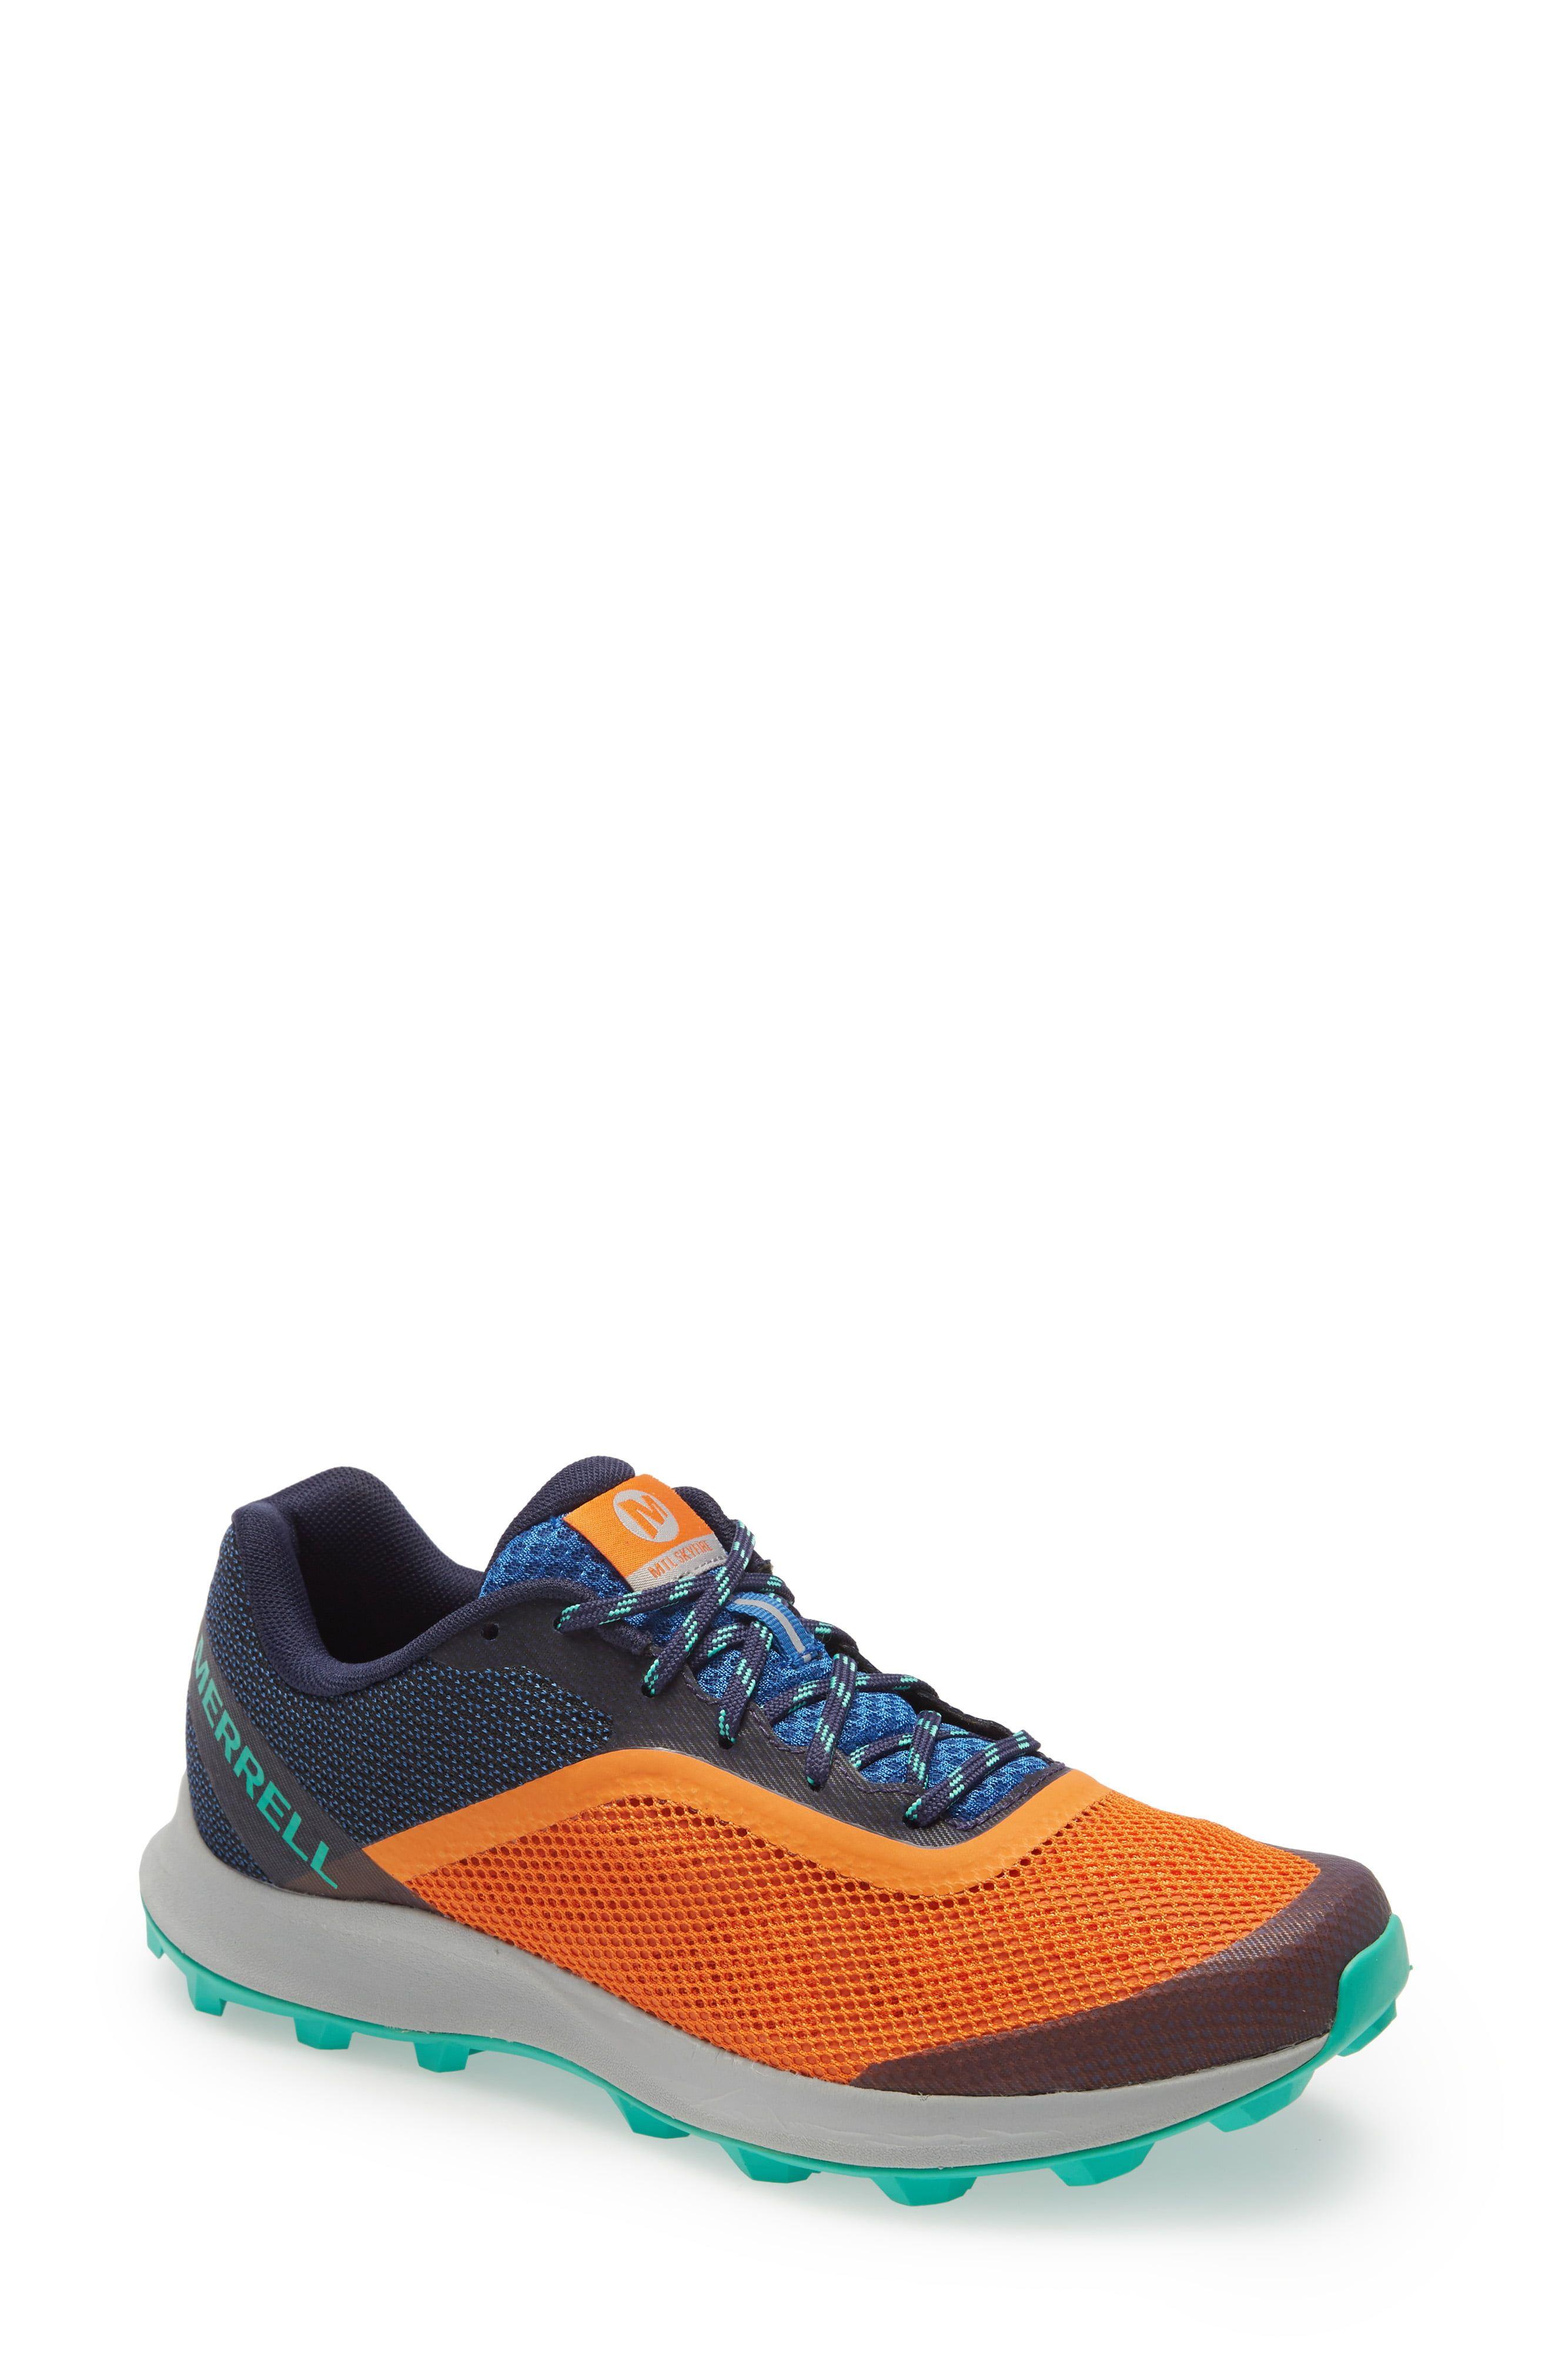 Merrell Womens Mtl Skyfire Track Shoe